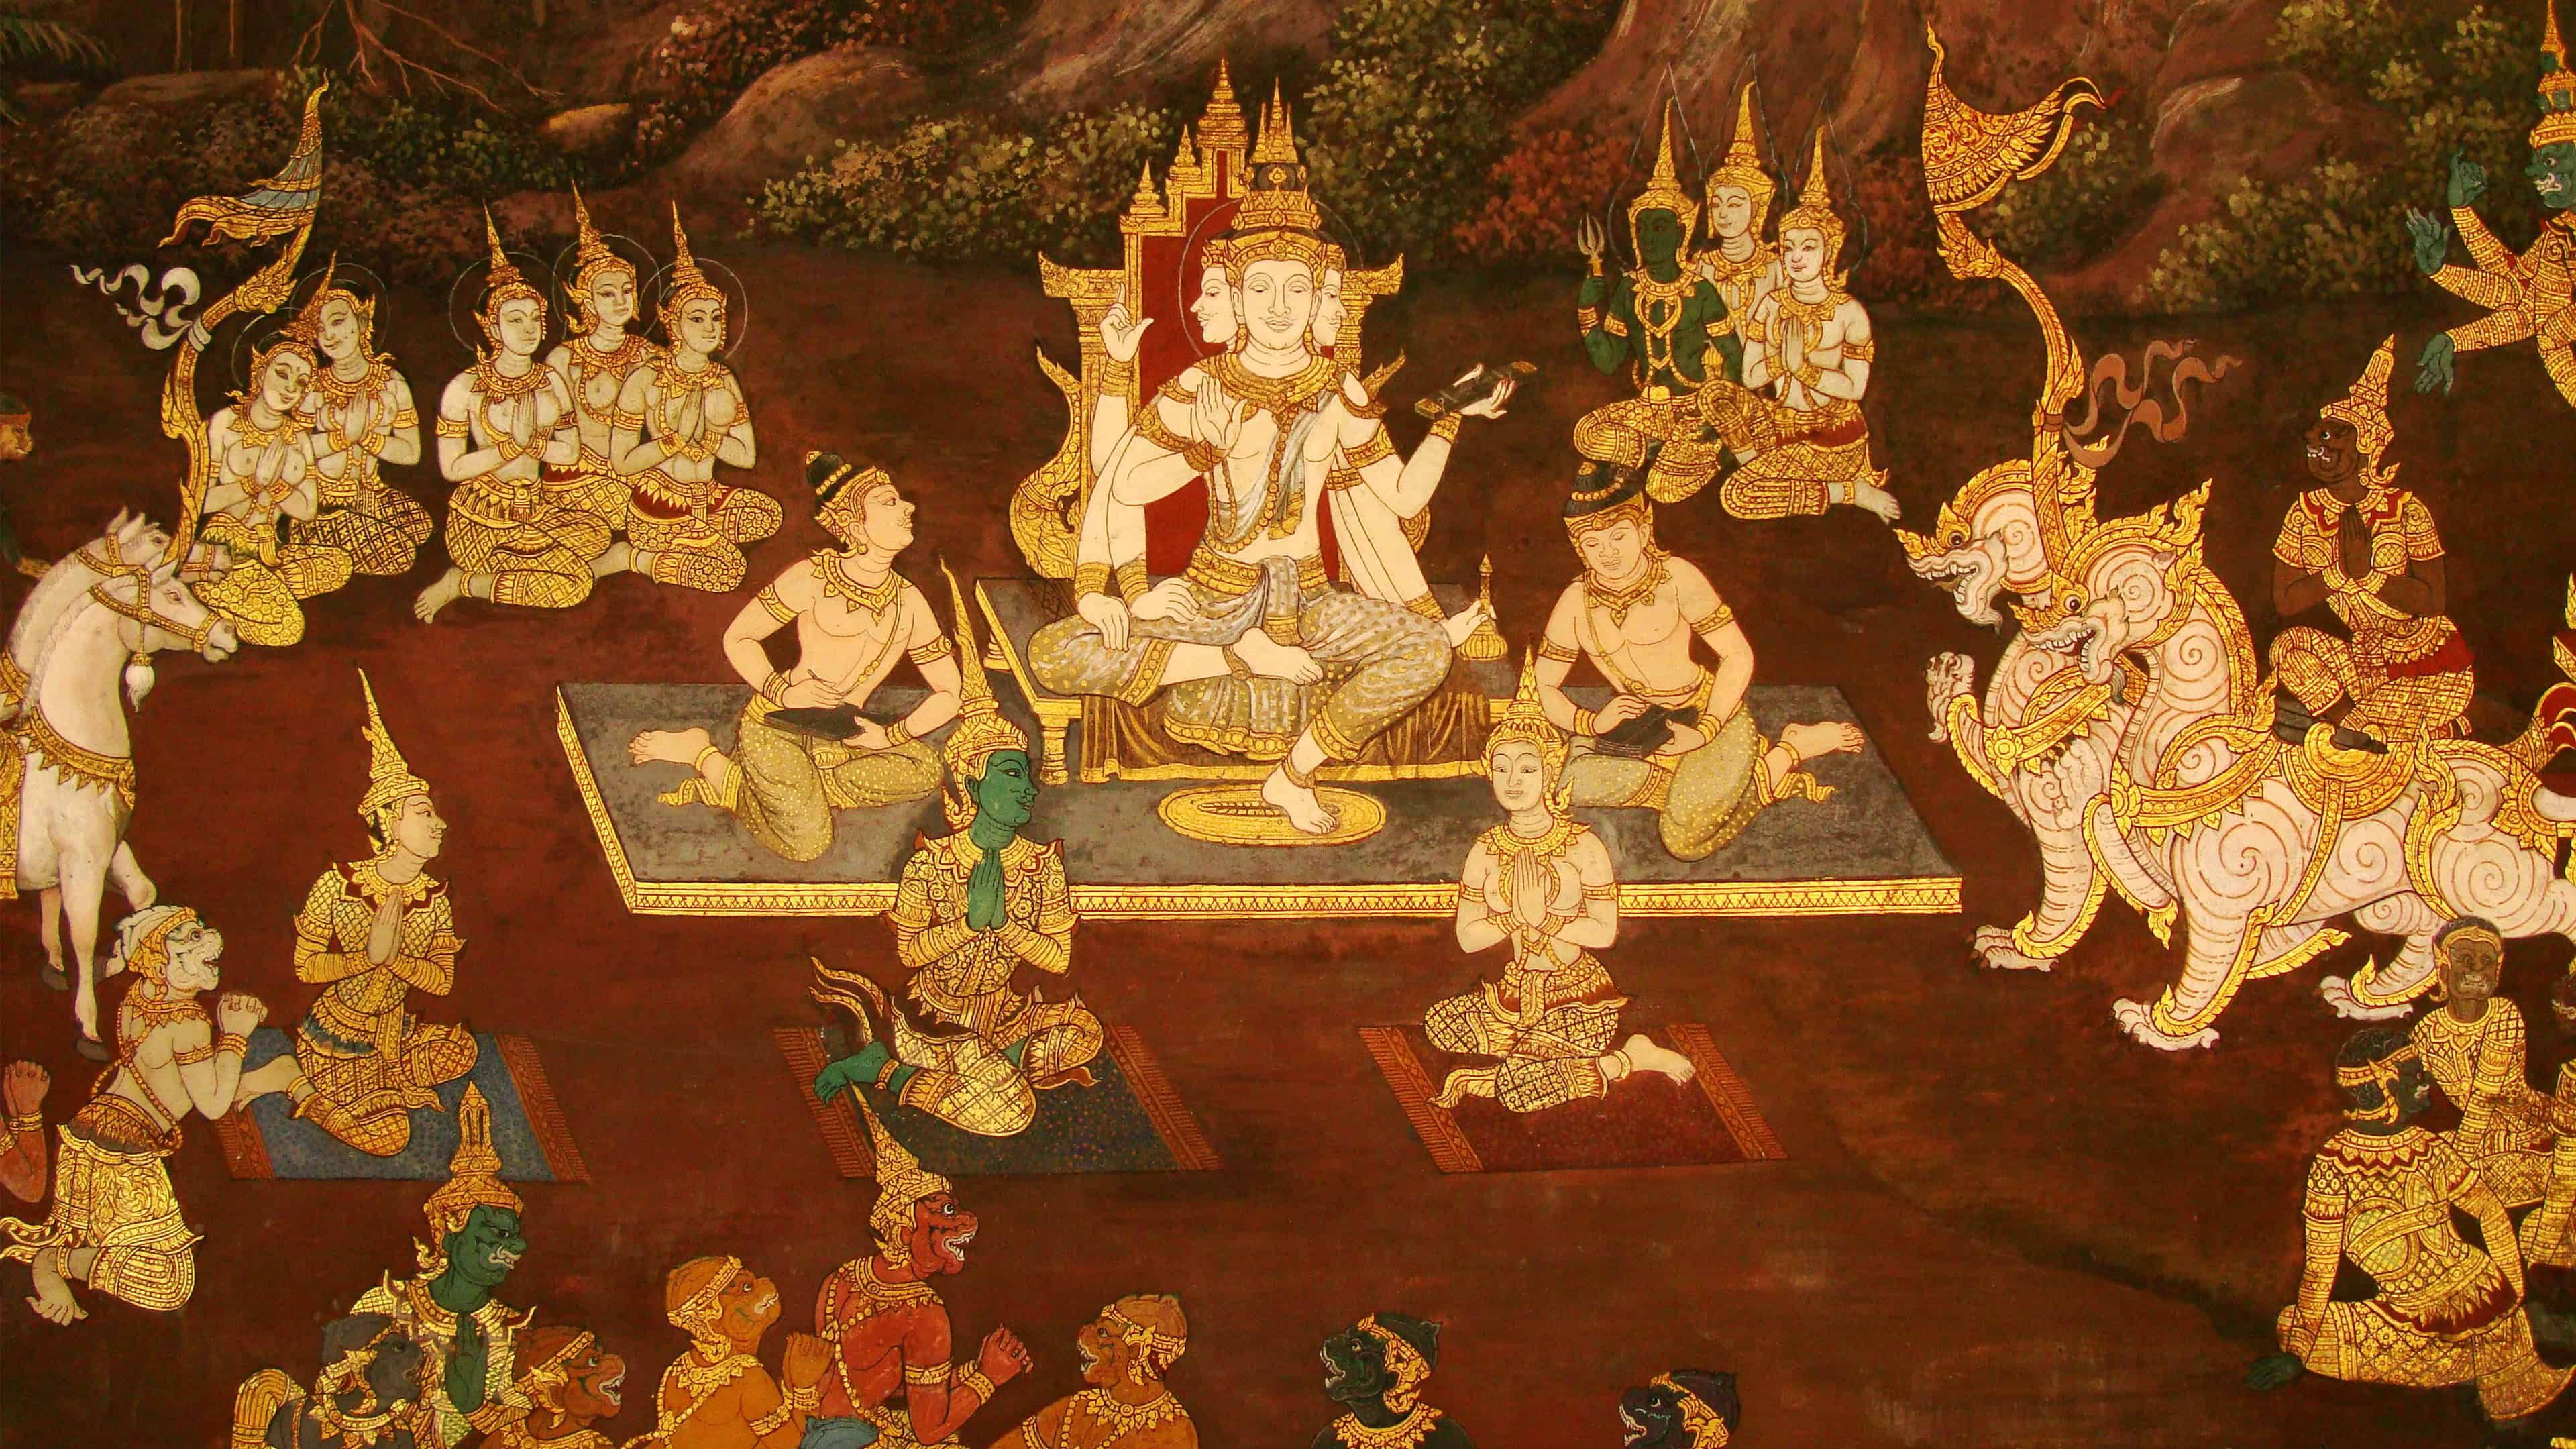 Thai Art UHD 4K Wallpaper Pixelz Thai art, Buddhist